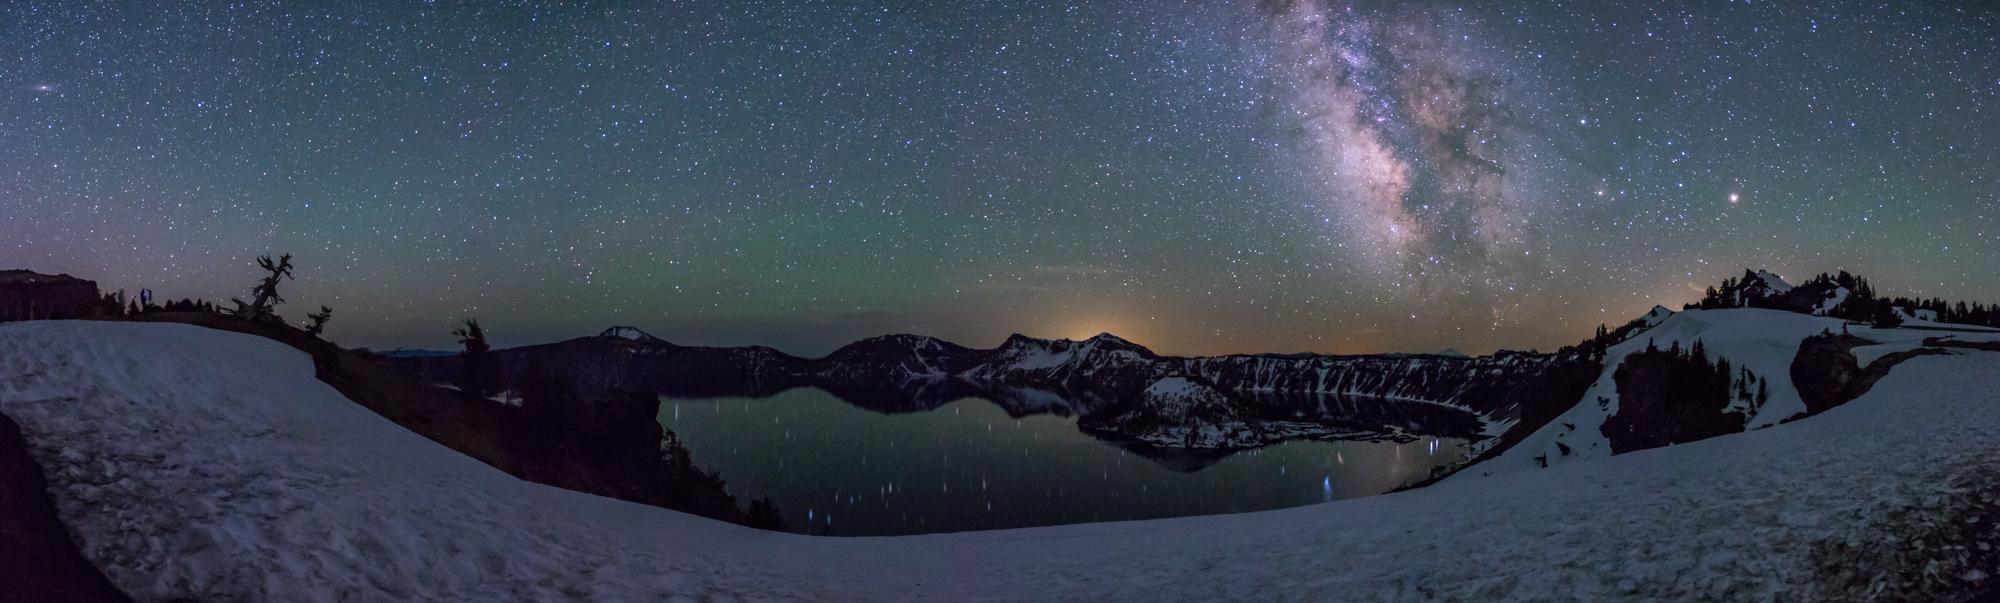 Crater Lake National Park - 049.jpg